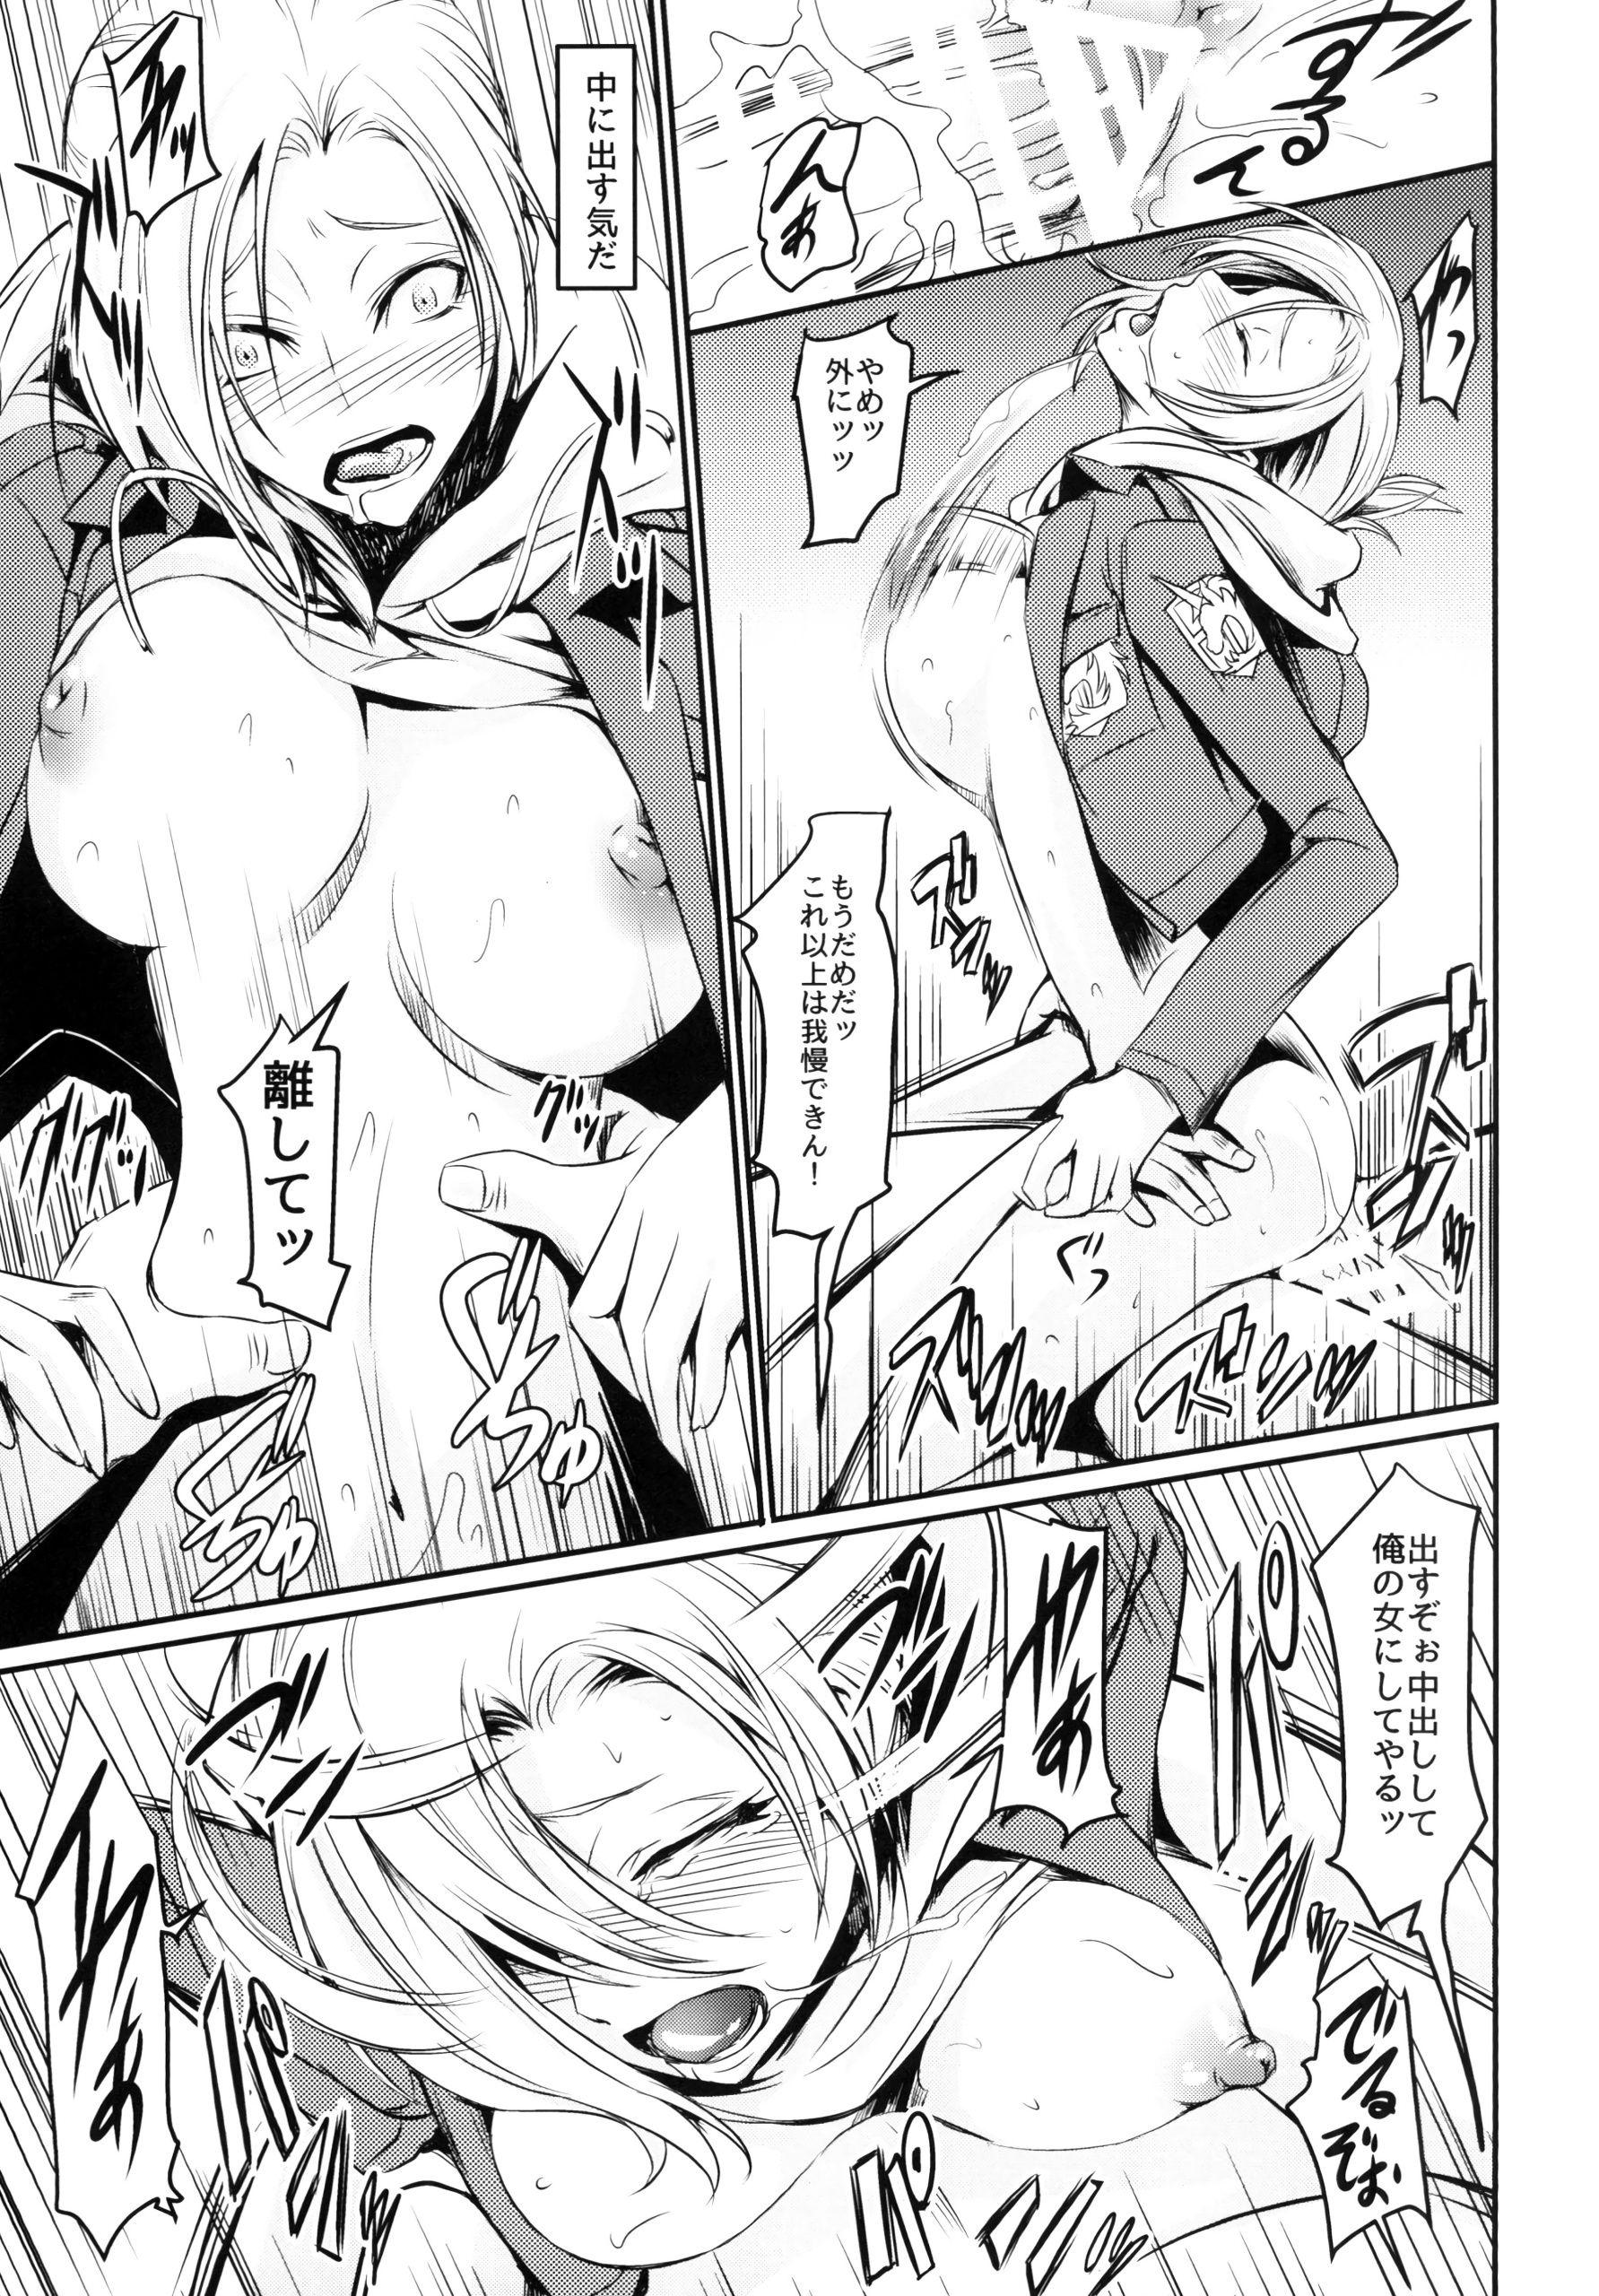 Hekinai chousa hentai manga picture 18